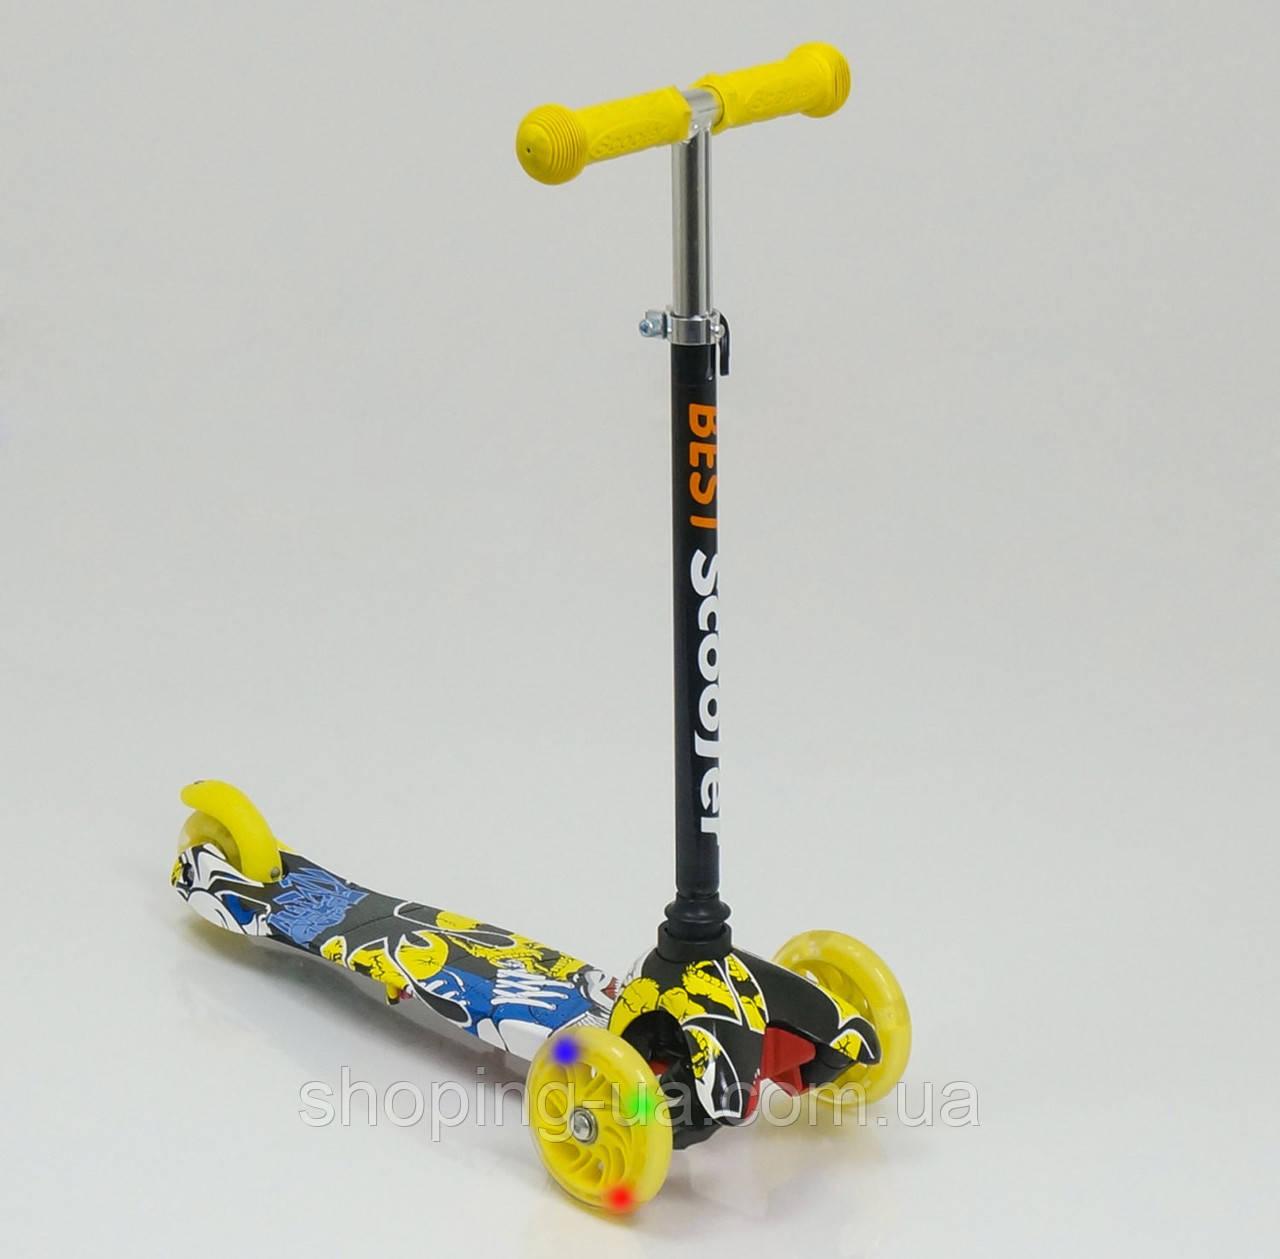 Трехколесный cамокат Mini Best Scooter 1294